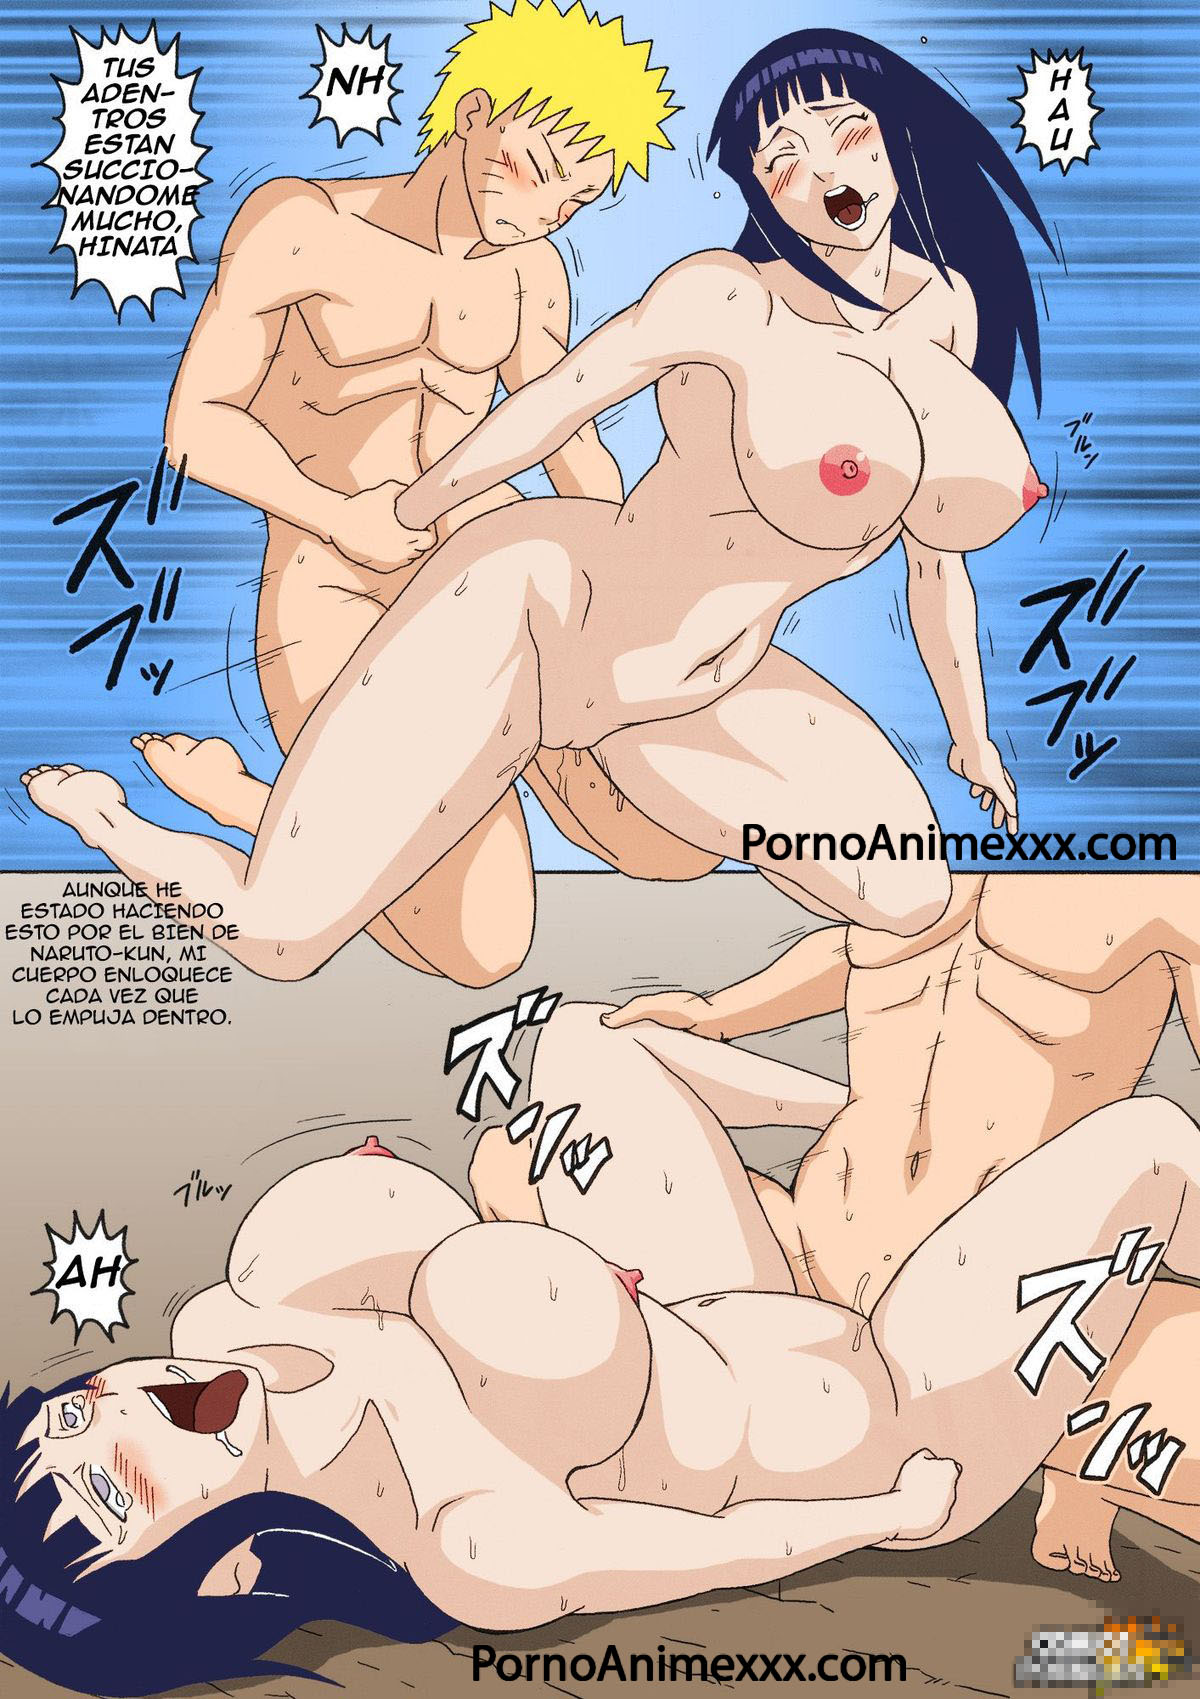 Naruto Hentai - Hinata follada - sexo con sakura - Naruto porno